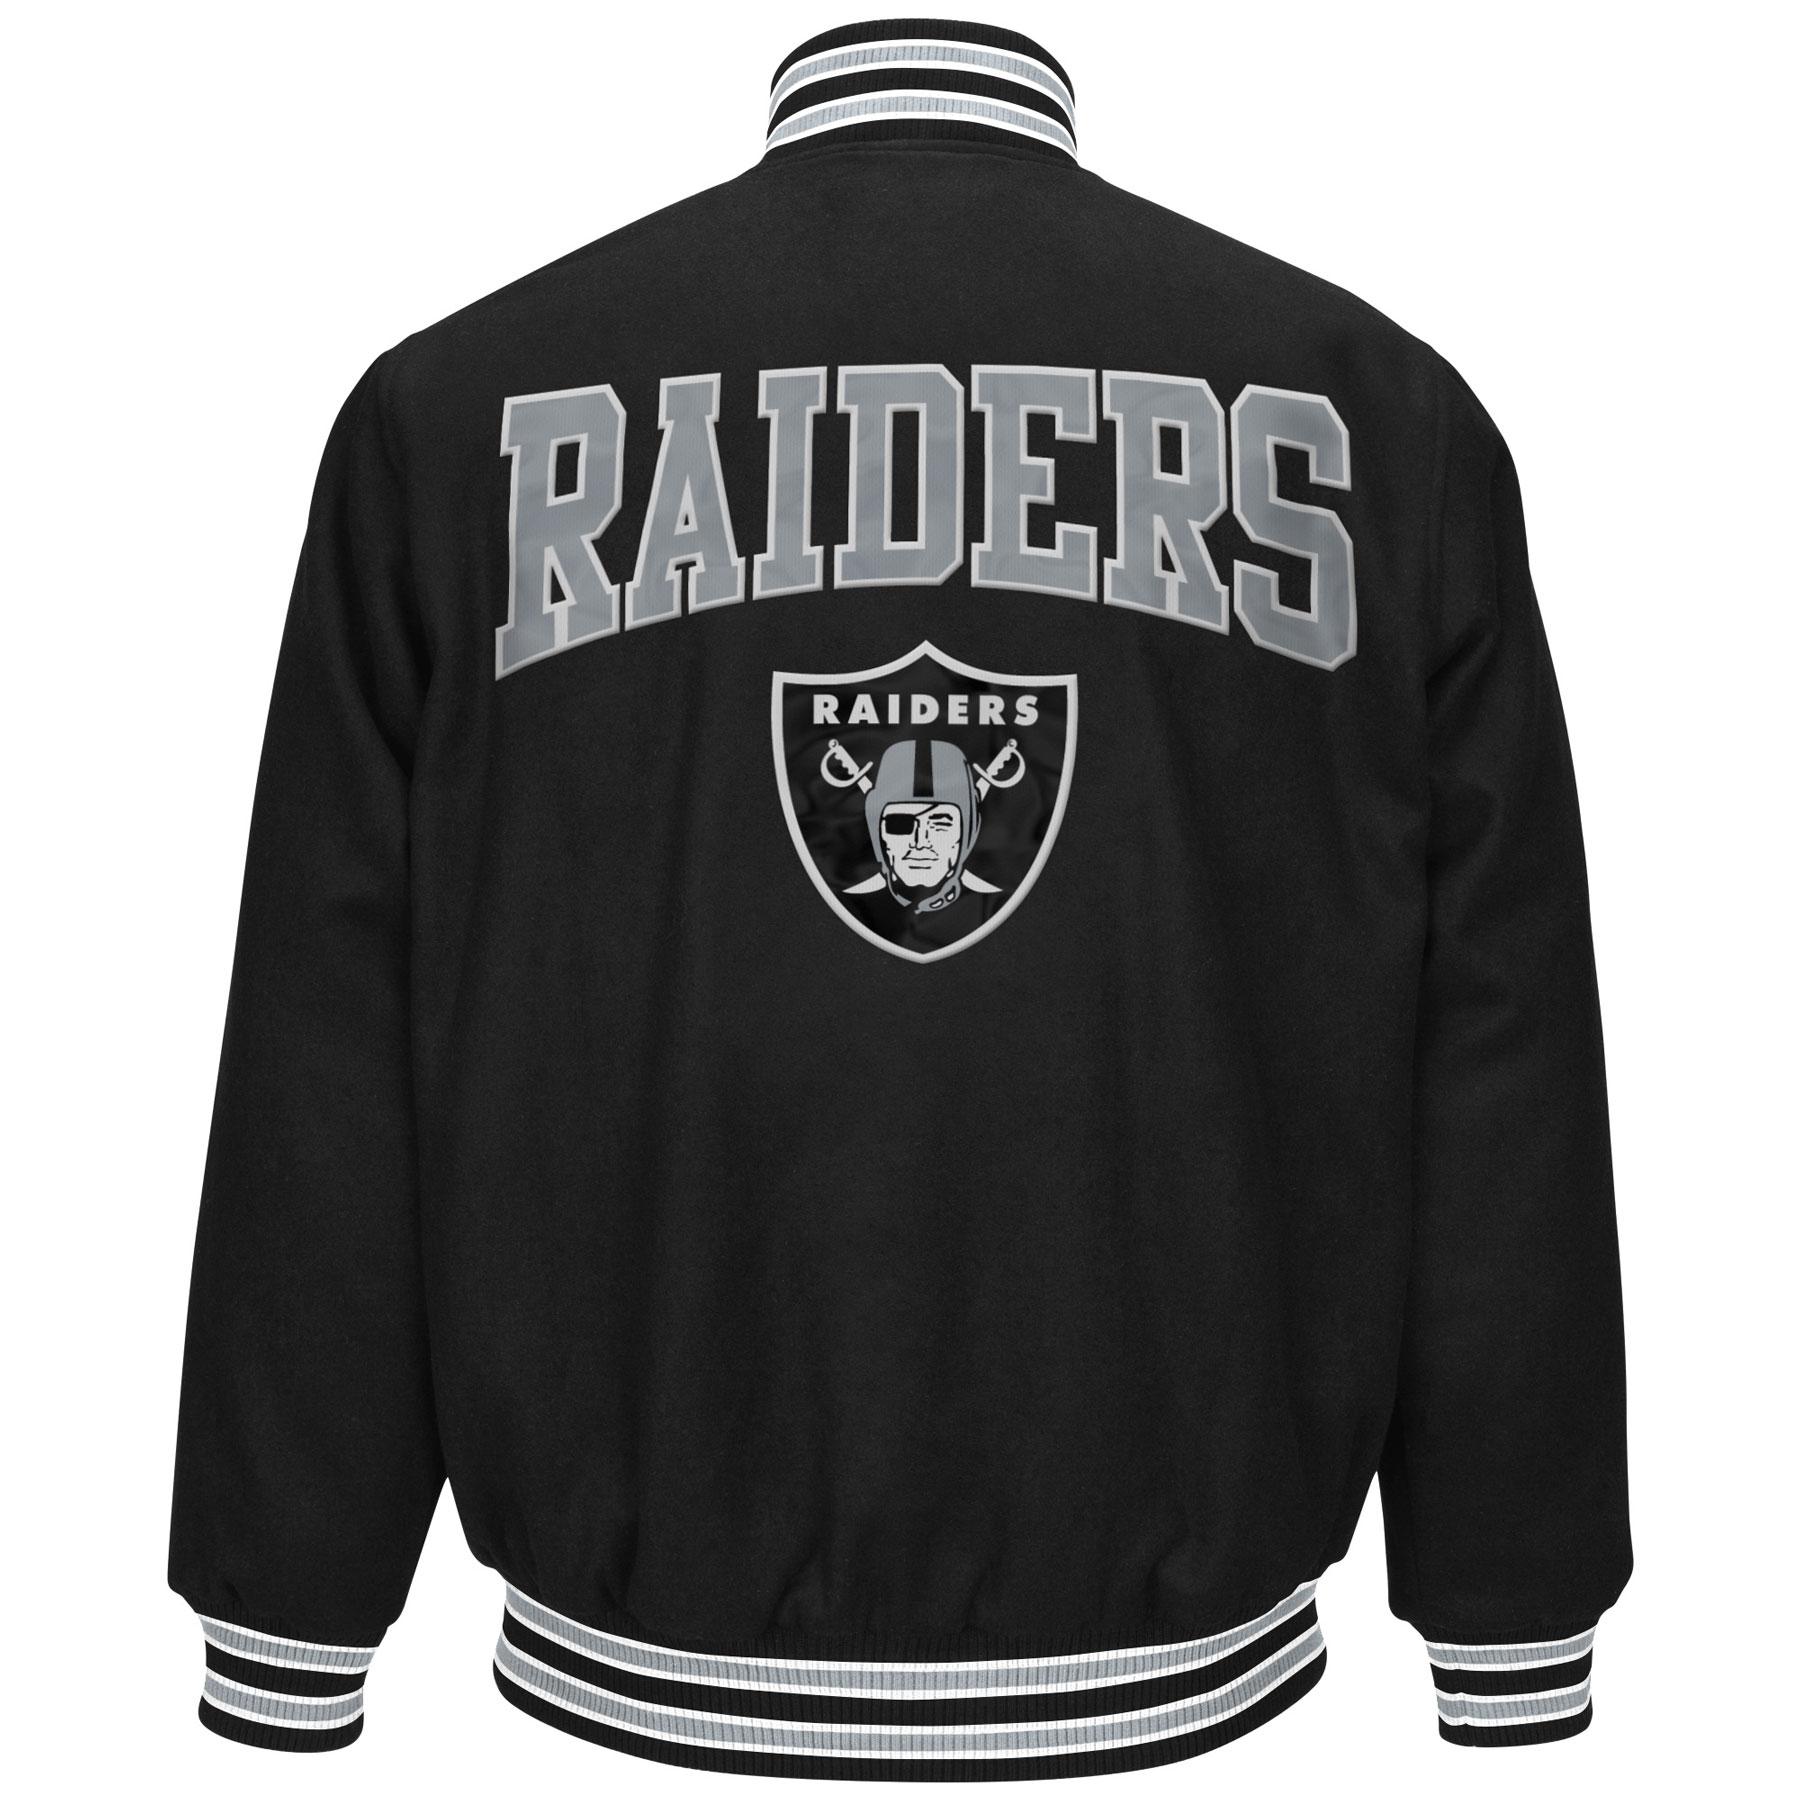 Raiders Varsity Jacket | Ebay Varsity Jackets | Oakland Raider Store